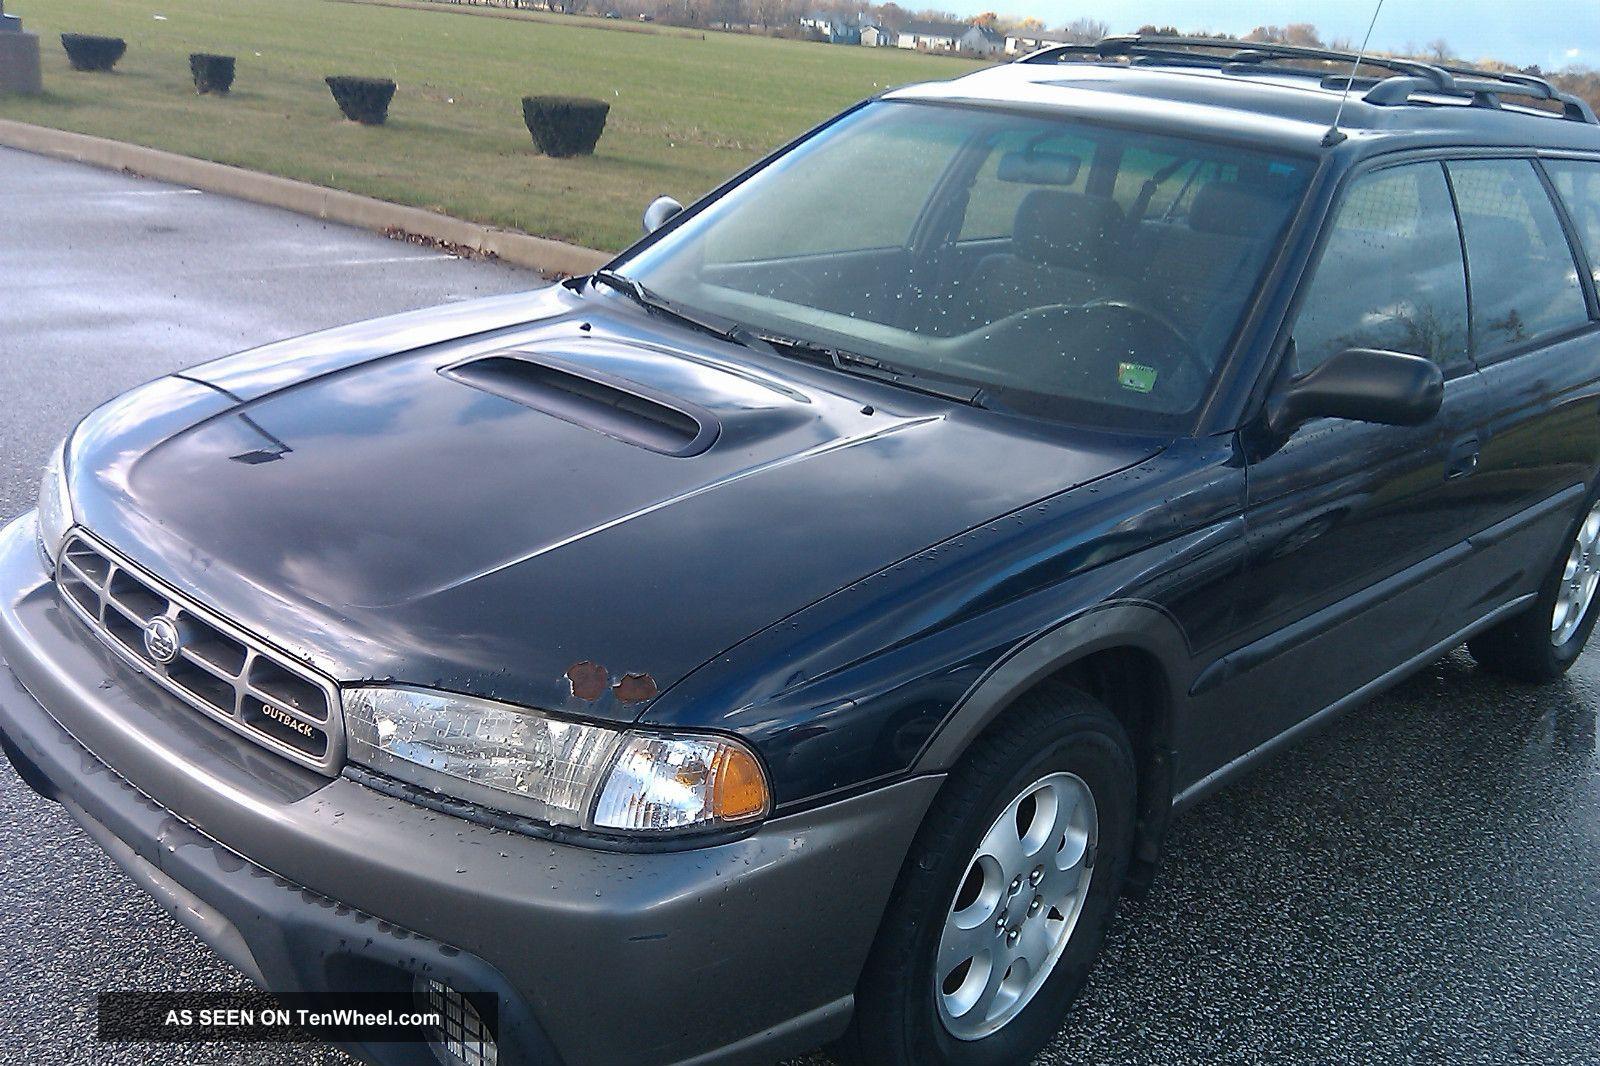 1999 Subaru Legacy Outback Wagon 4 Door 2 0 Turbo Not